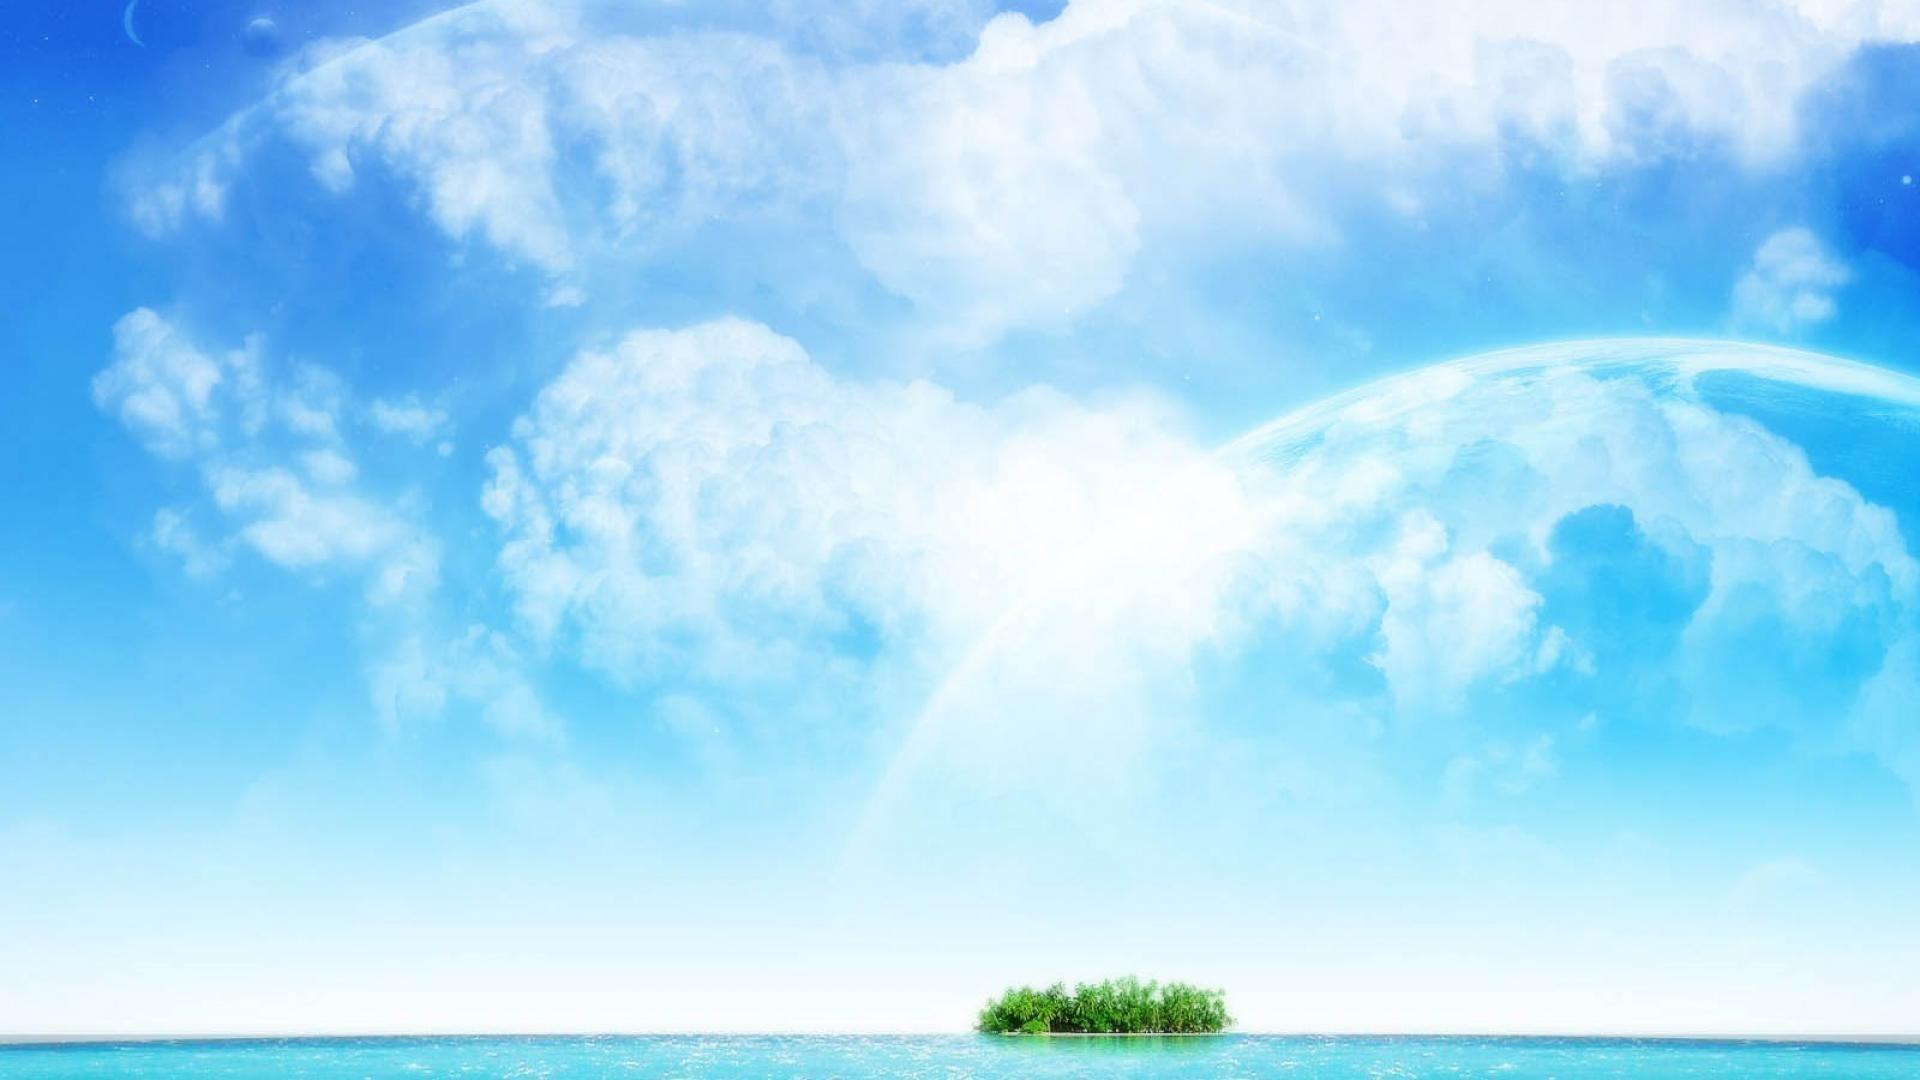 blue sky wallpaper (71+ images)